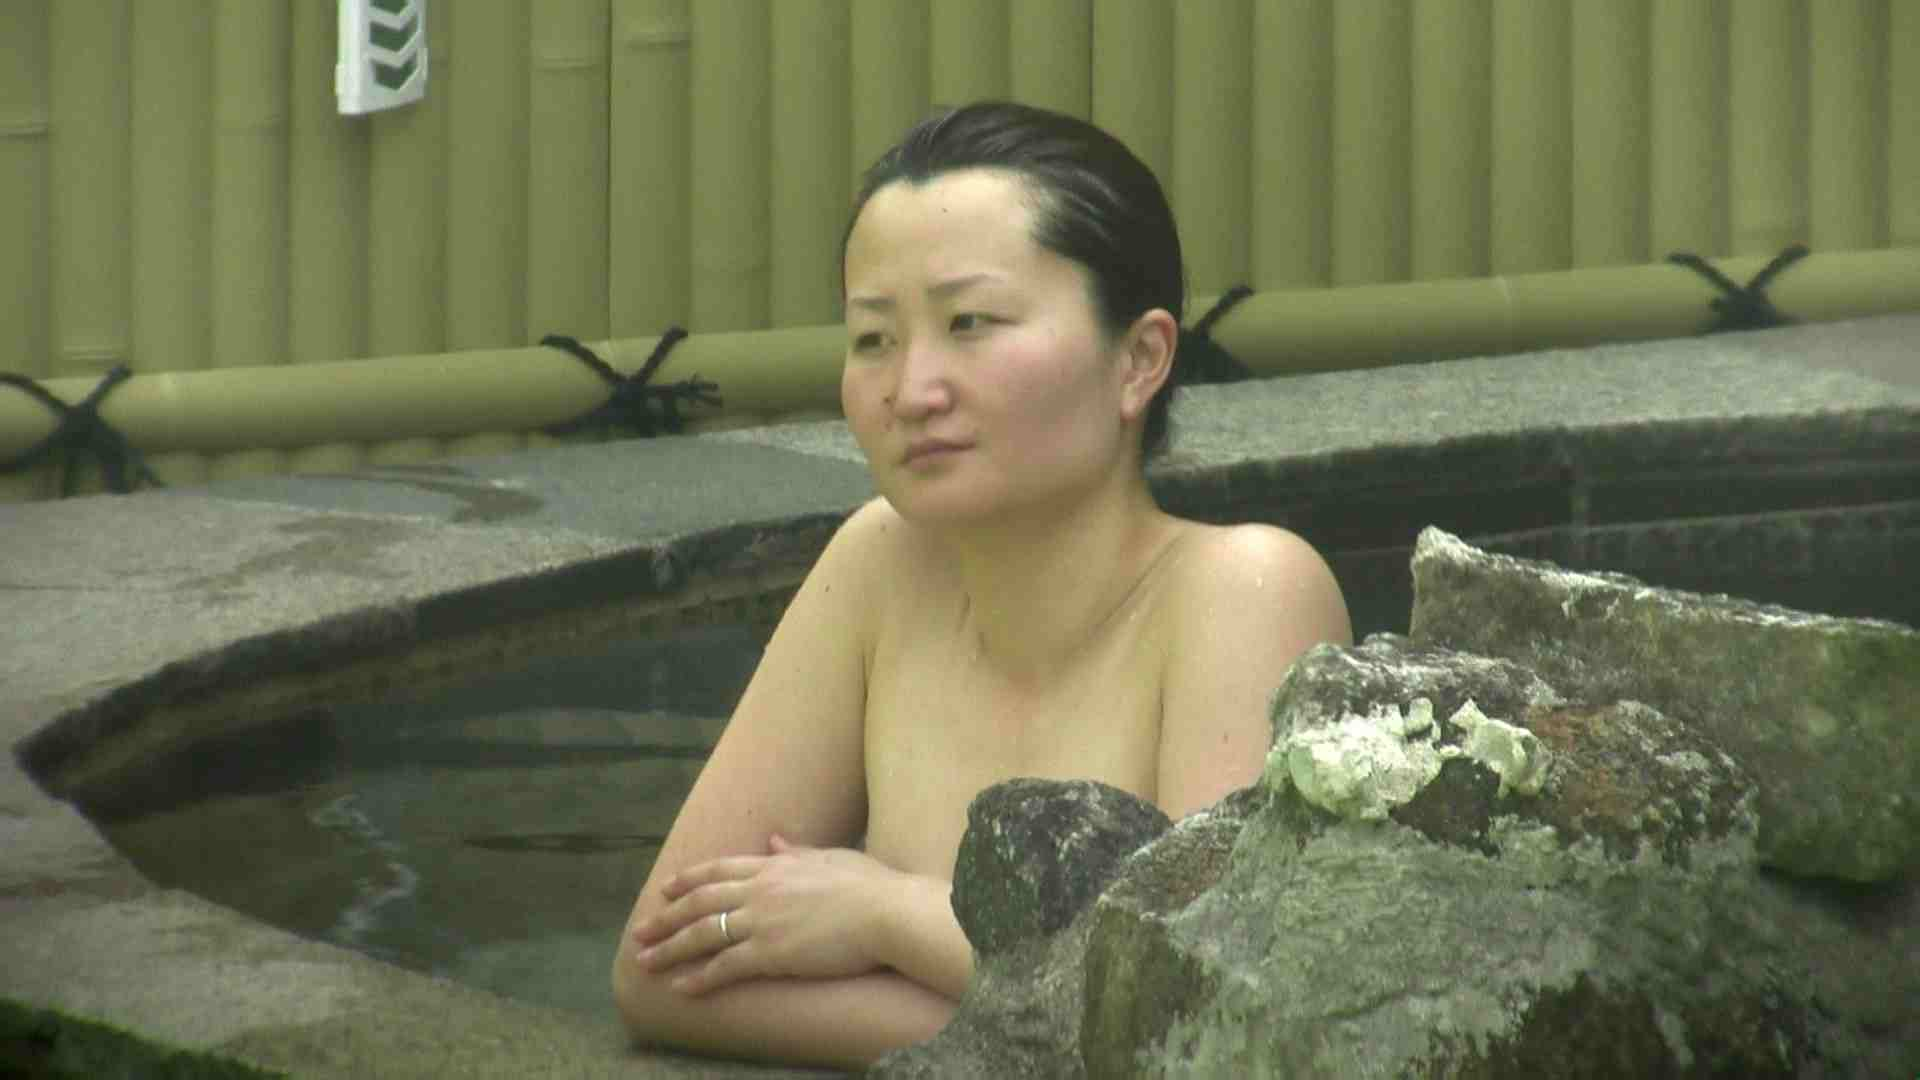 Aquaな露天風呂Vol.632 盗撮 | OLセックス  70画像 13